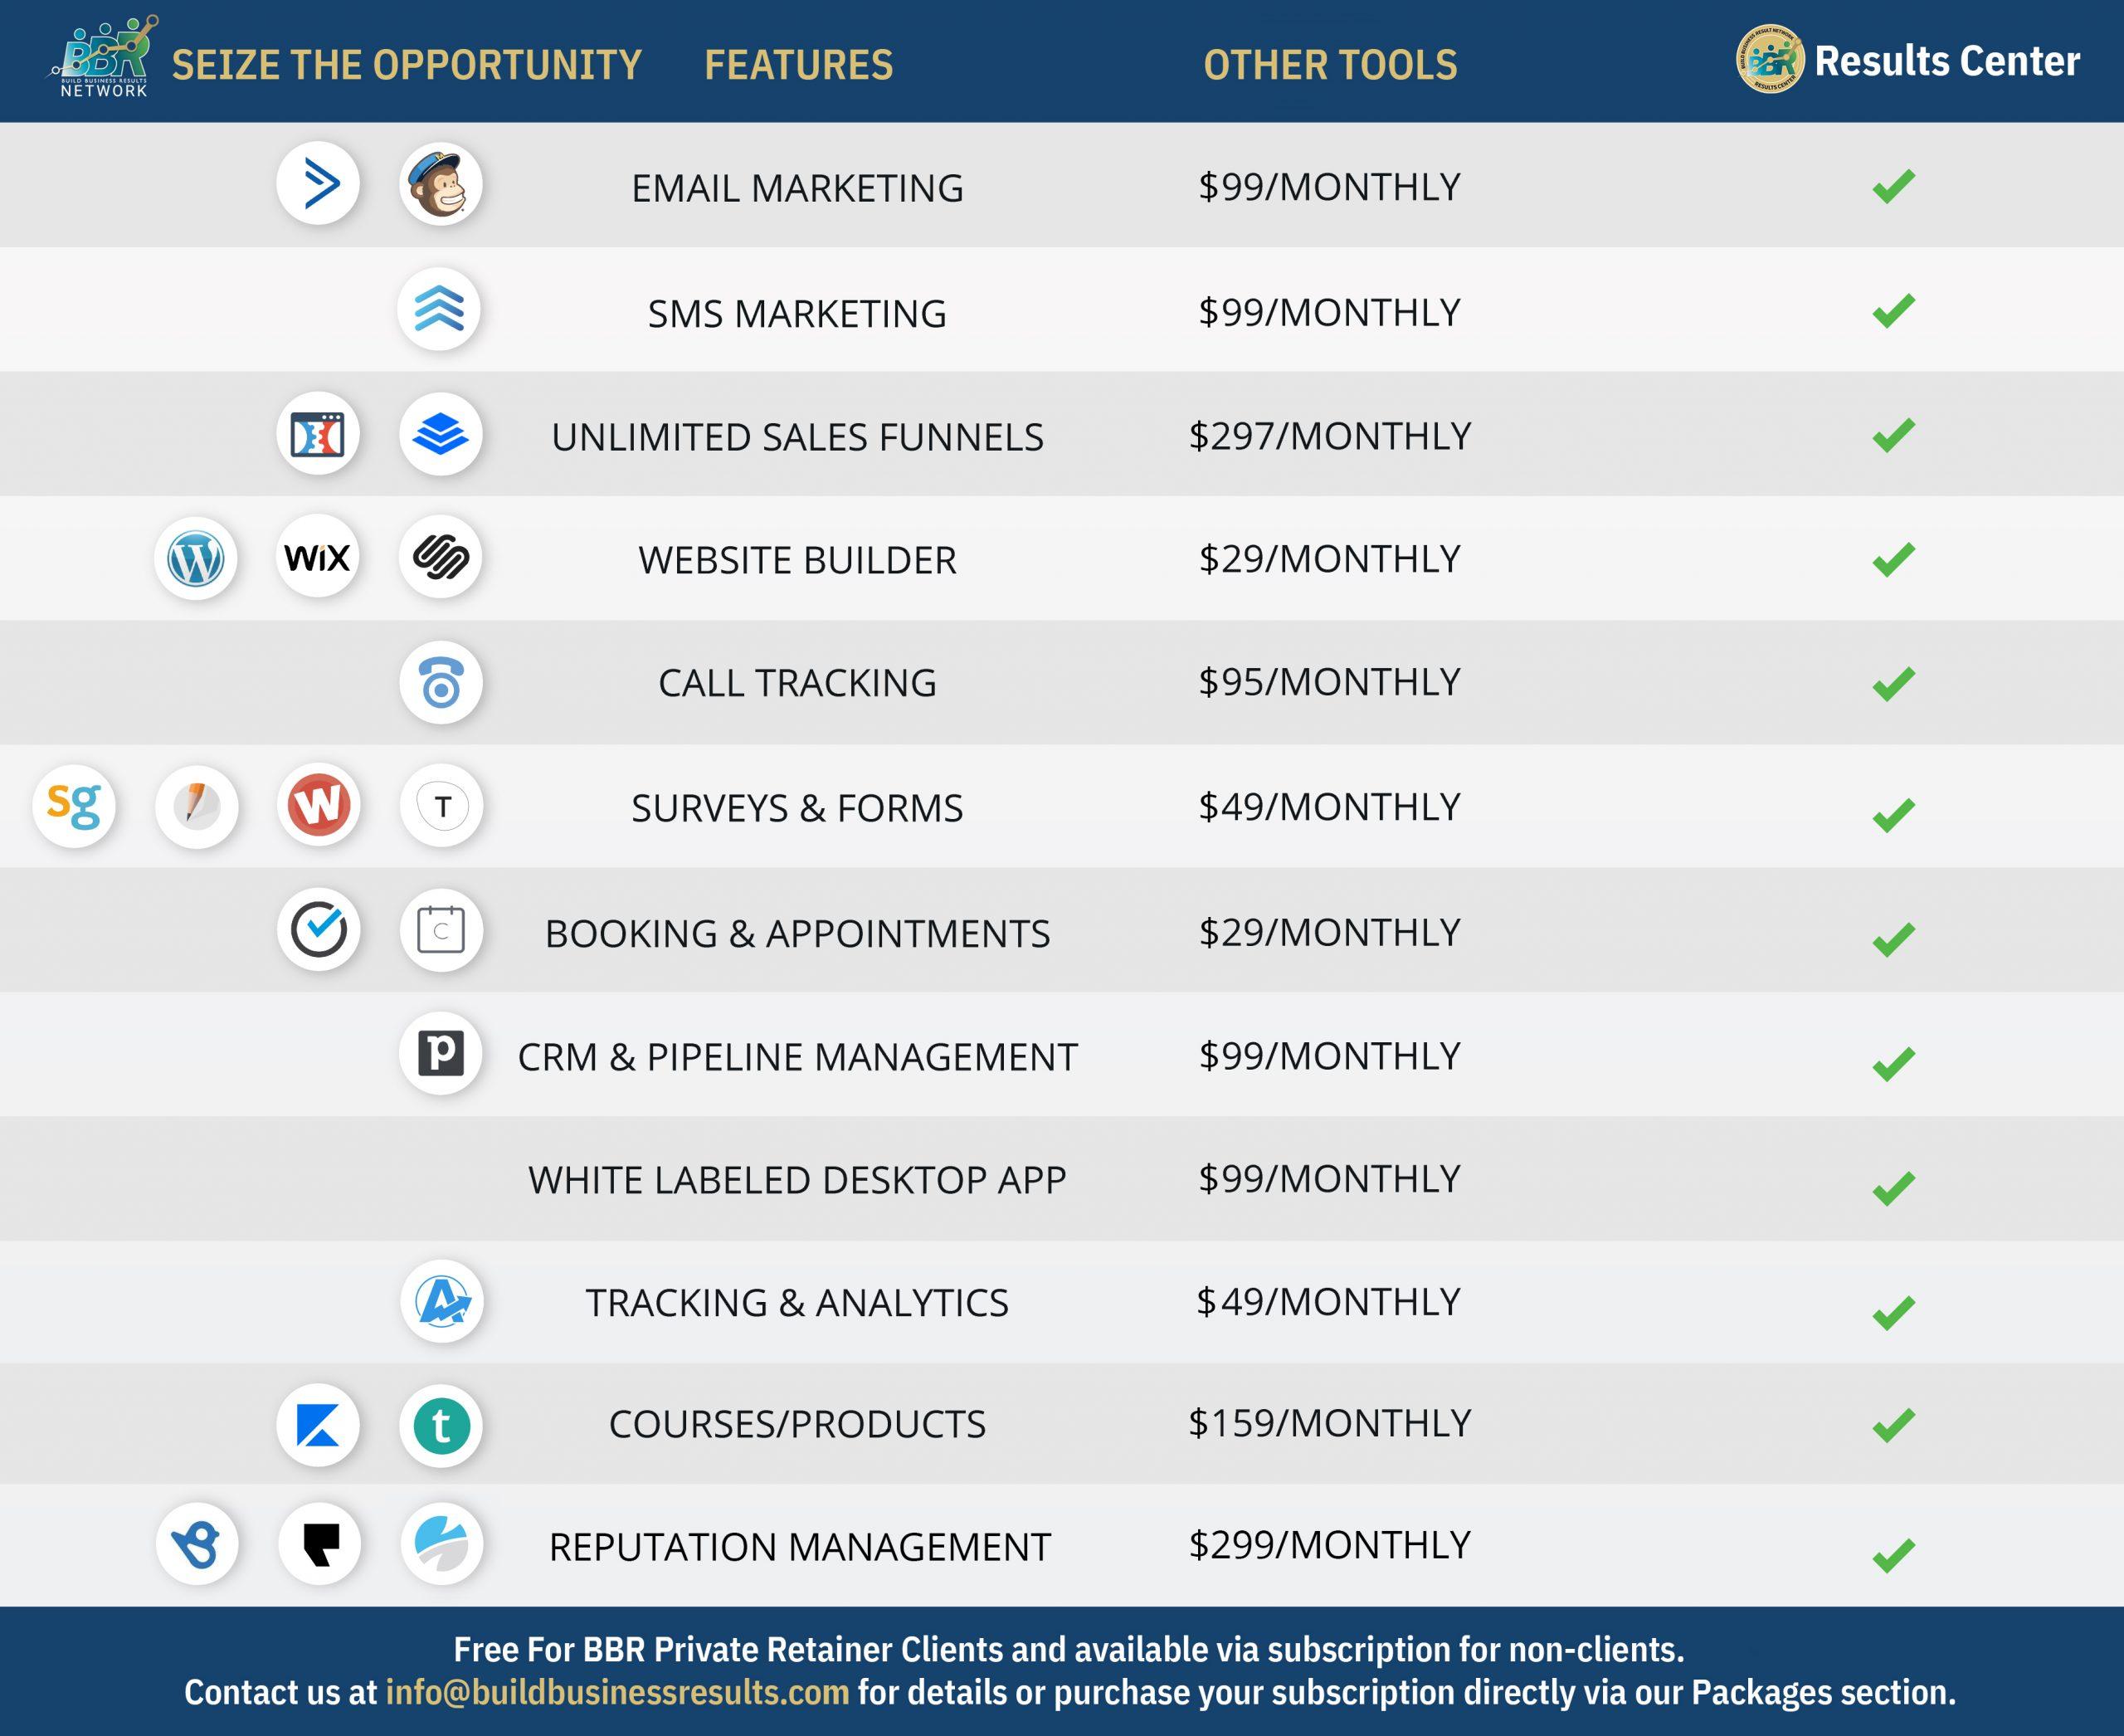 ResultsCenter ComparisonChart